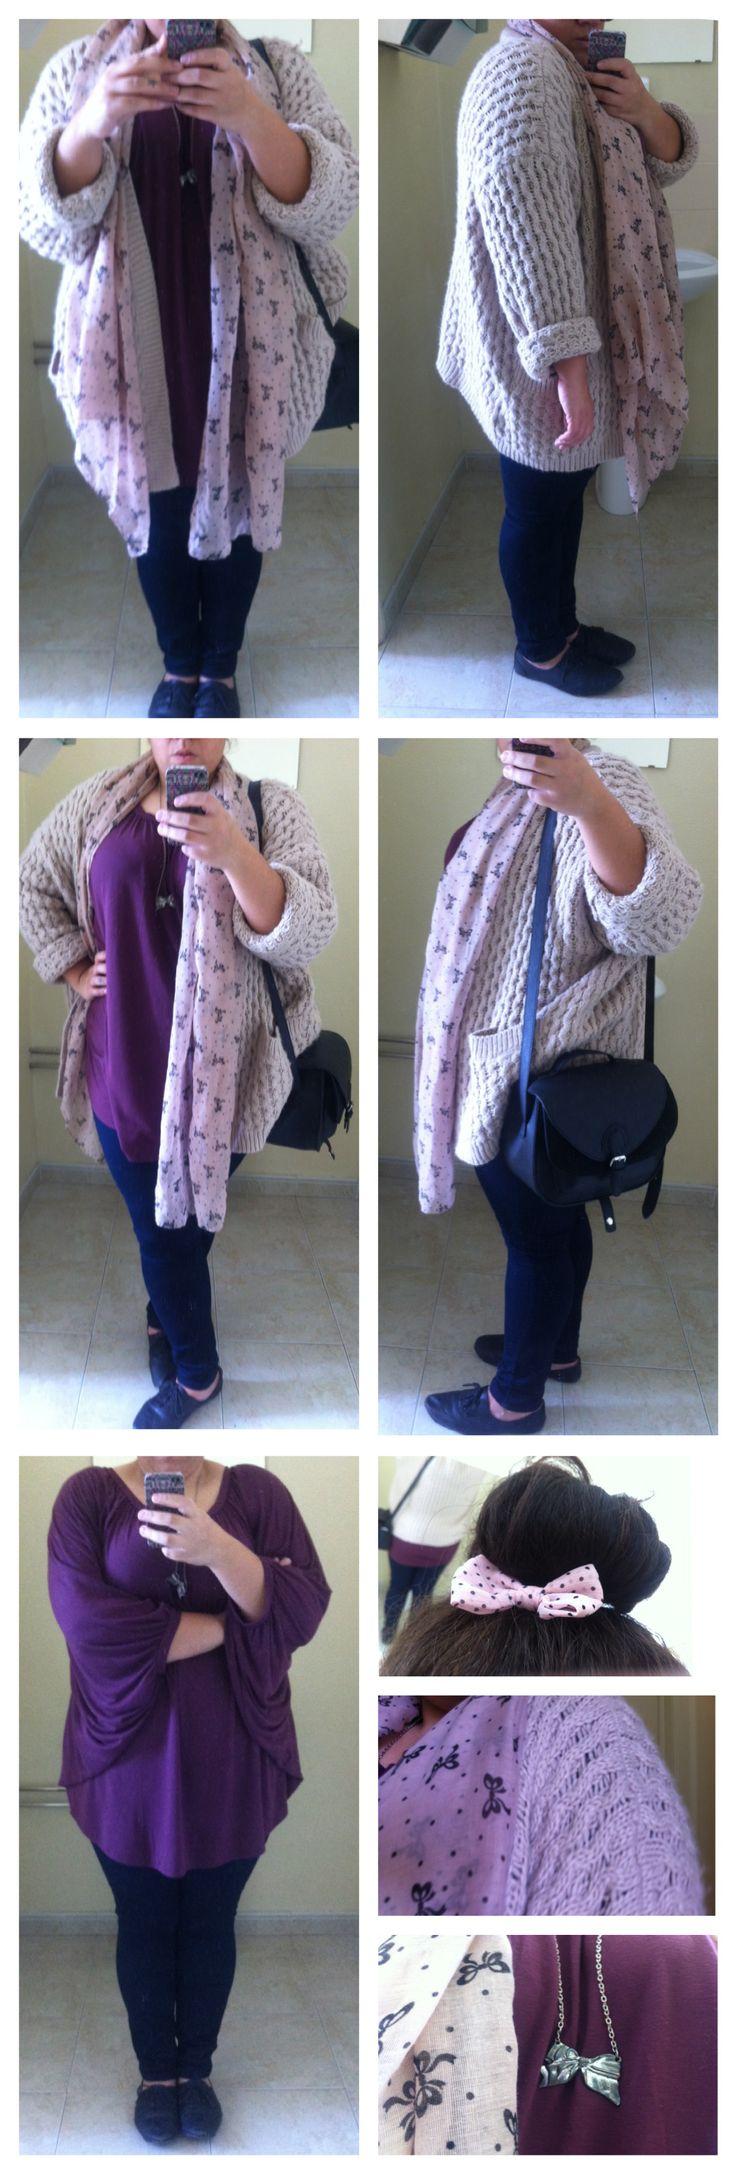 #ootd 43 #plussize  cardigan // H&M · shirt // Tezenis · jeans // Primark · scarf // Primark · bag // H&M · shoes // Primark · bow // Claire's